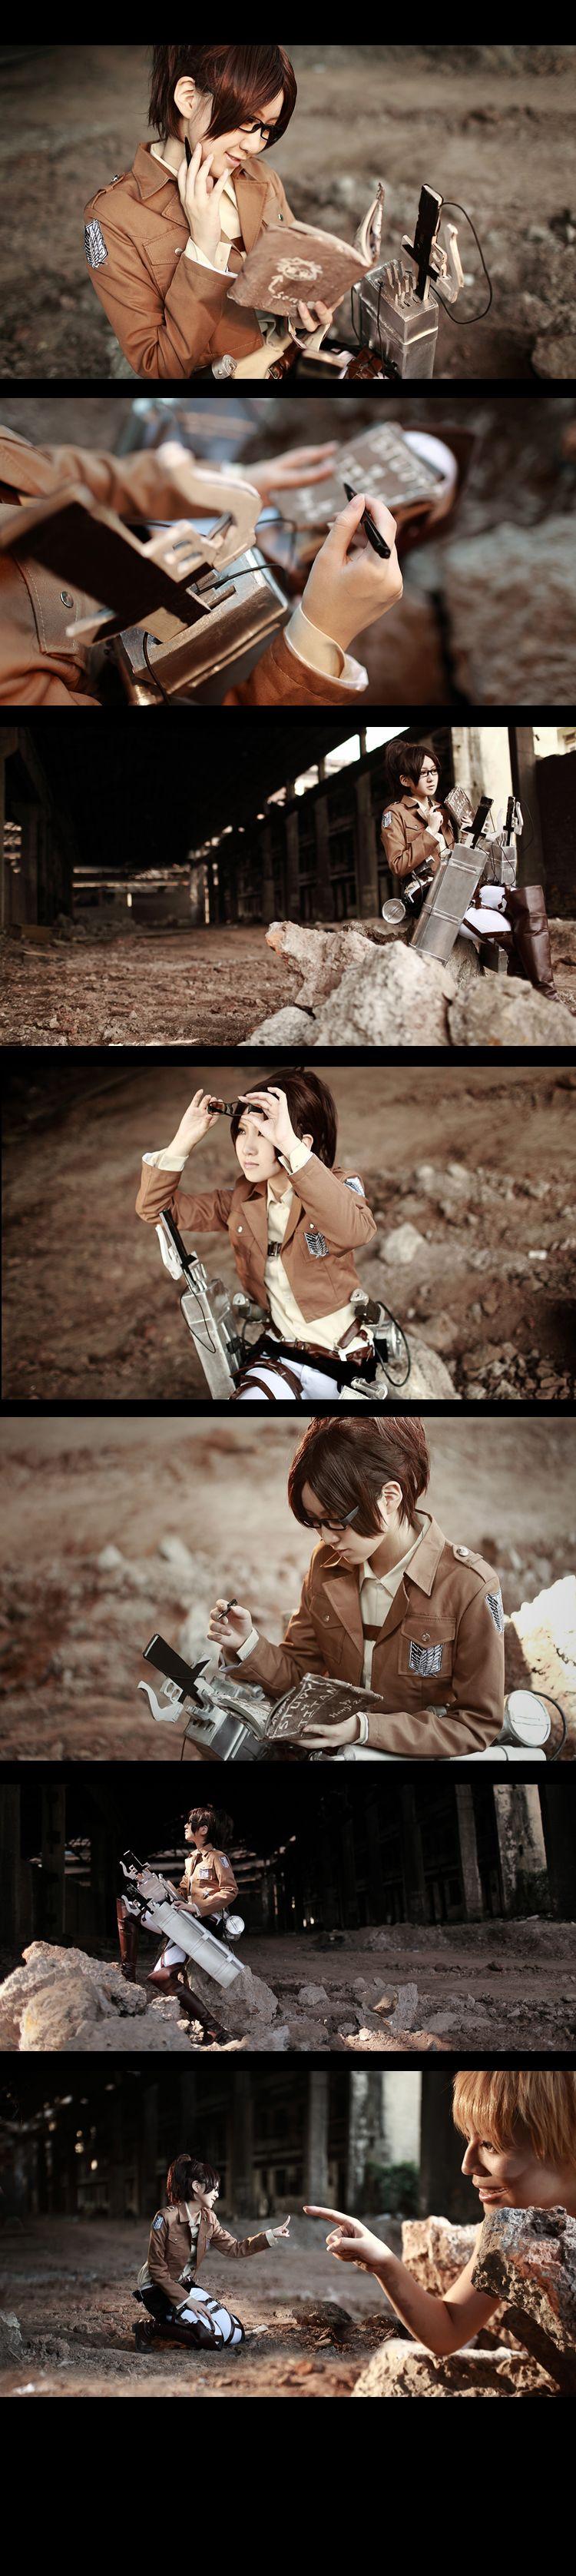 Attack on Titan Hanji Zoe4 by 35ryo on DeviantArt